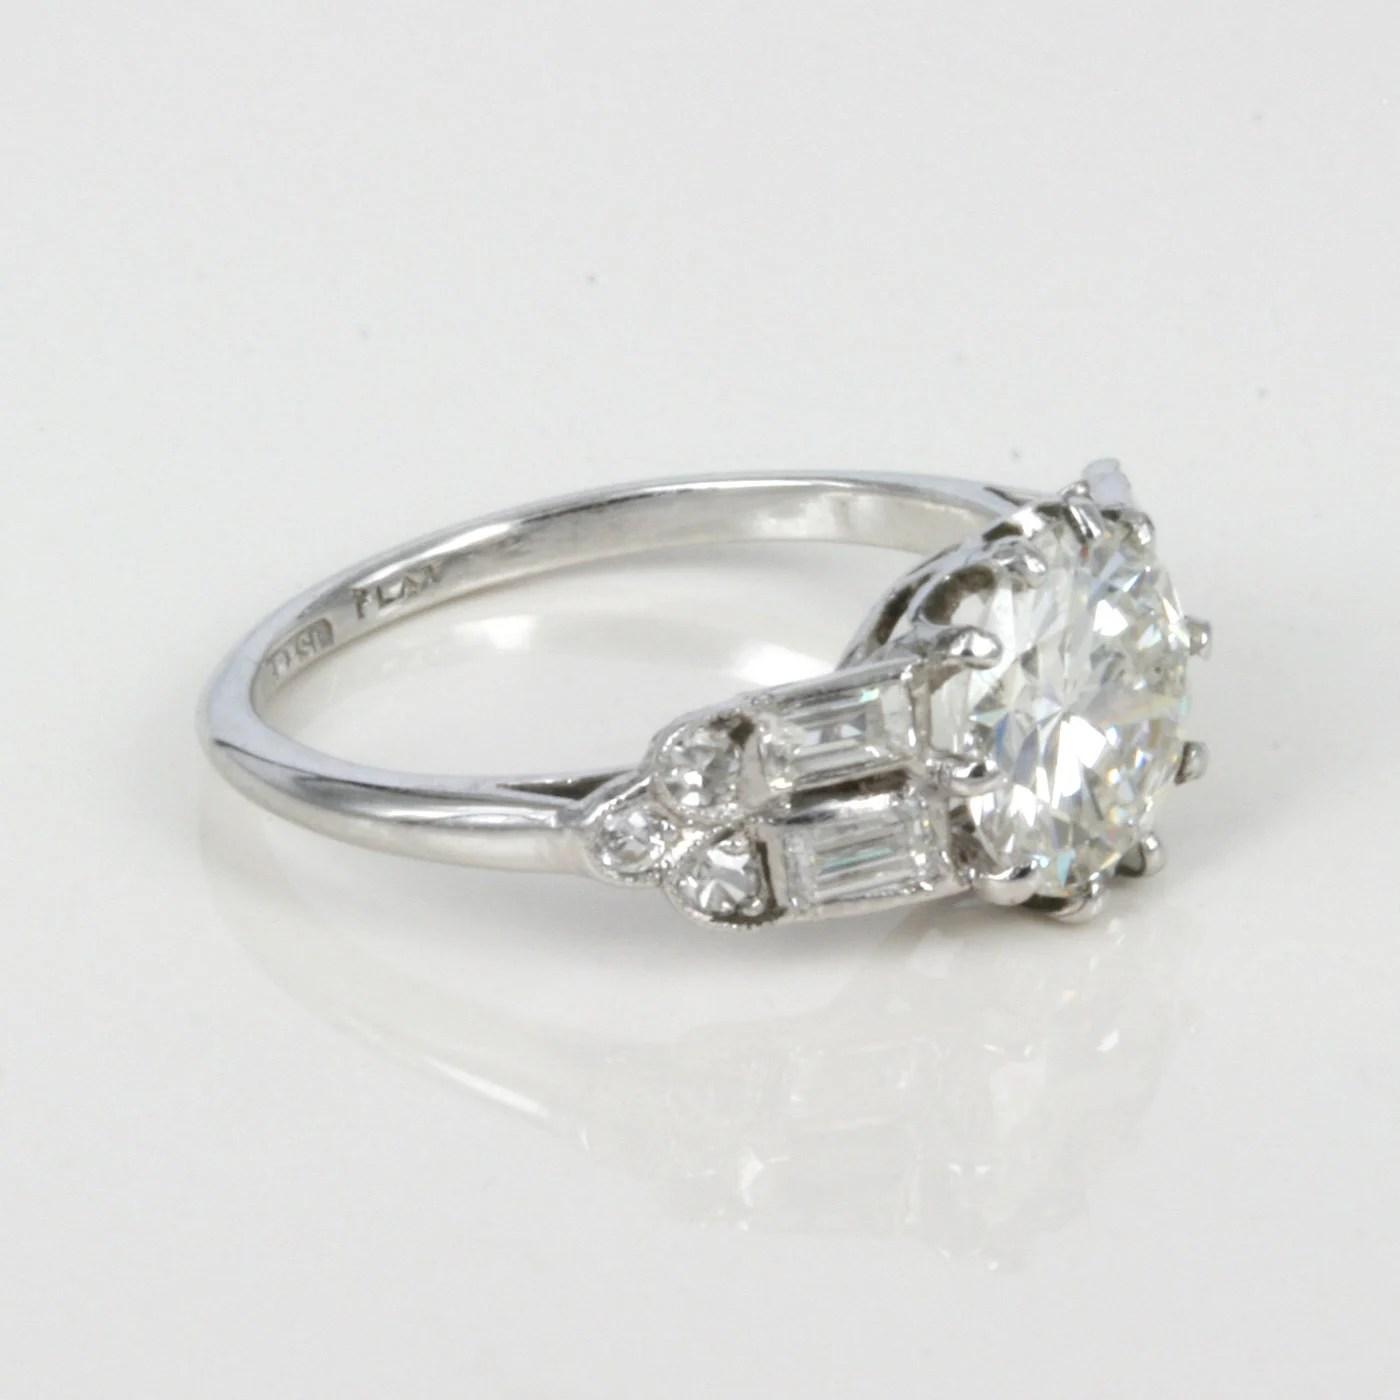 Buy Art Deco Diamond Ring In Platinum Sold Items Sold